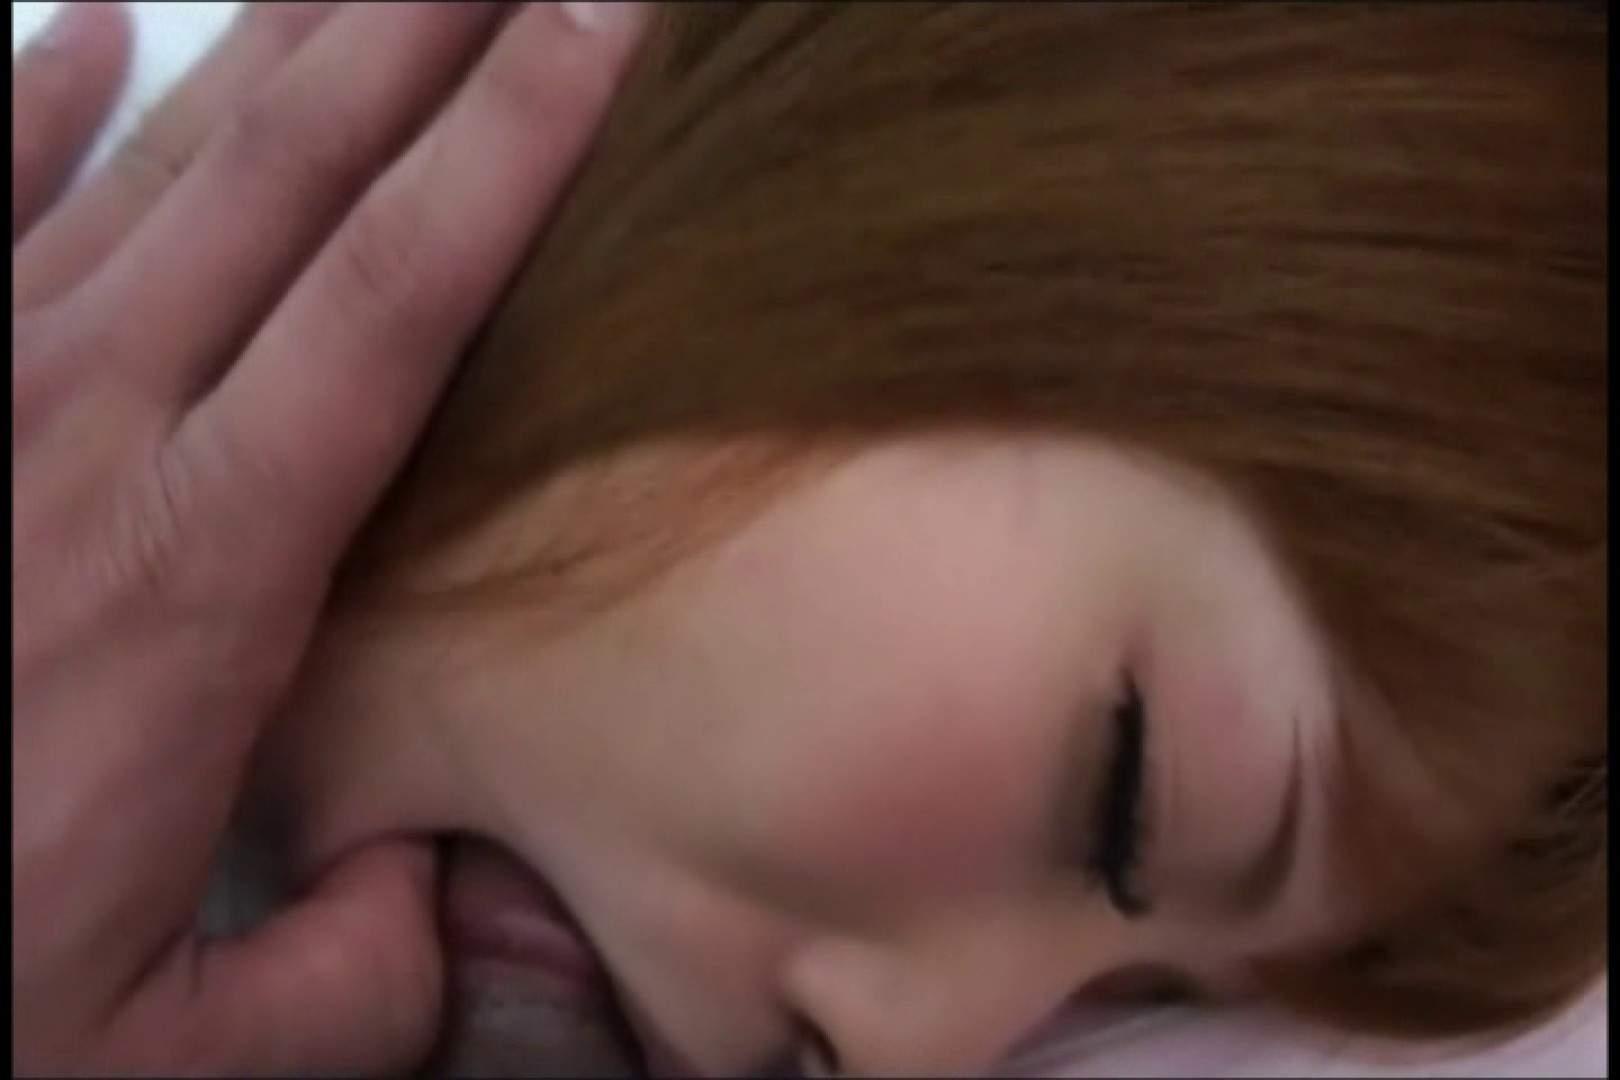 vol.9 [小春ちゃん]もはや起きているという錯覚に・・・-後編- セックス 戯れ無修正画像 110枚 43